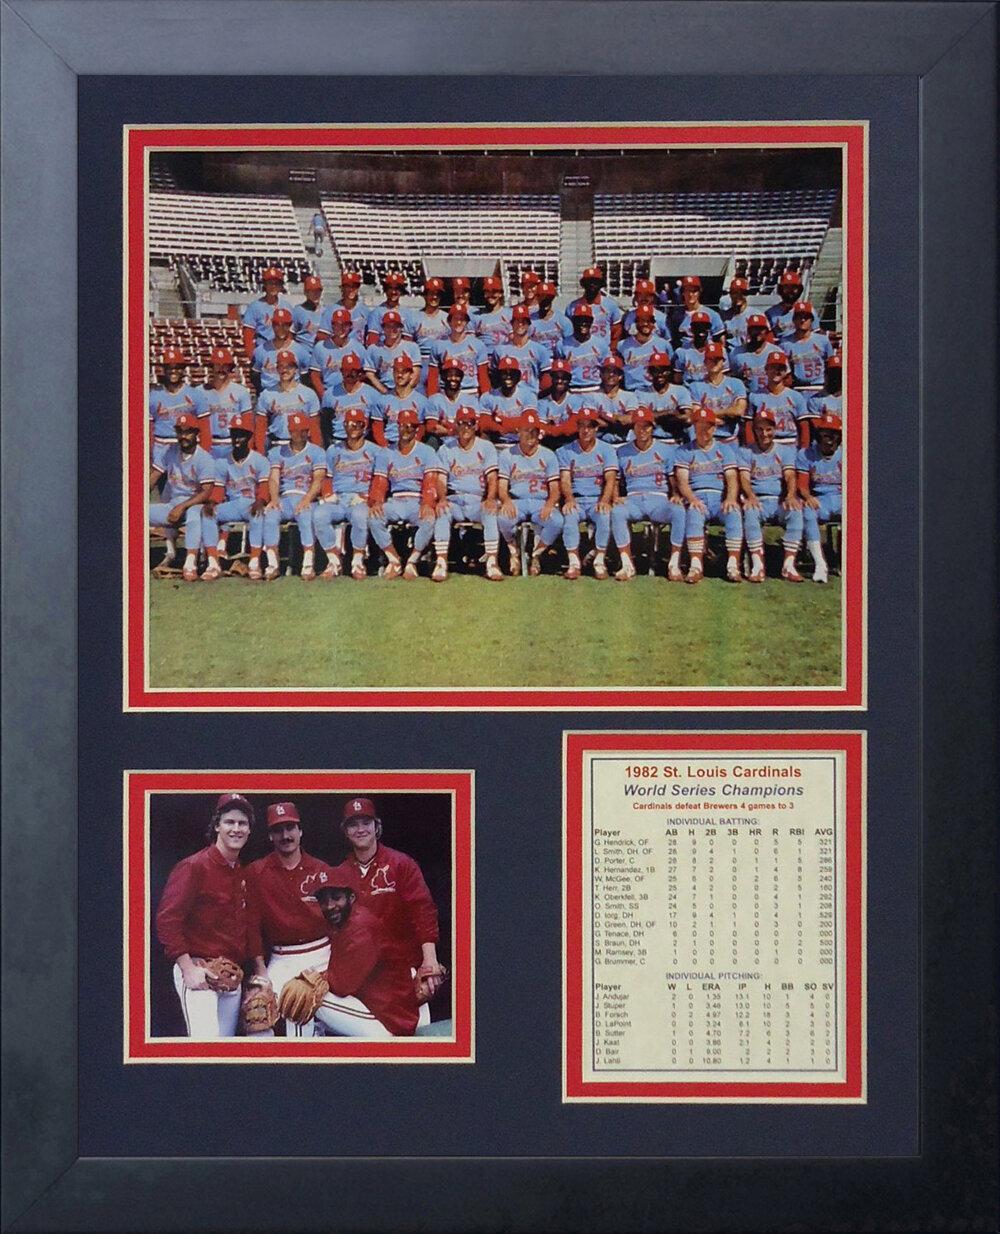 Legends Never Die 1982 St Louis Cardinals Framed Photographic Print